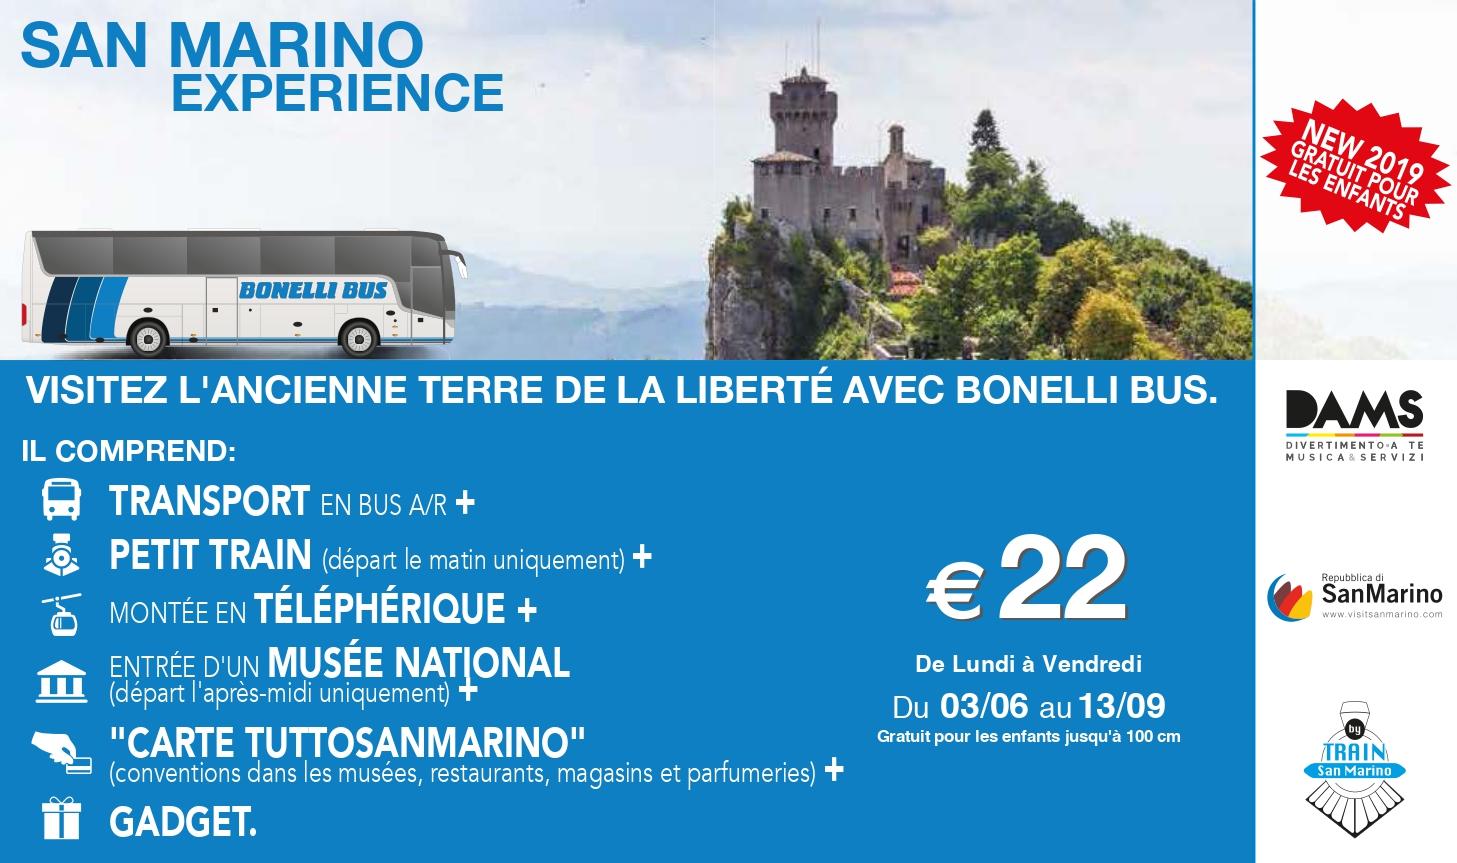 Saint Marin experience bus